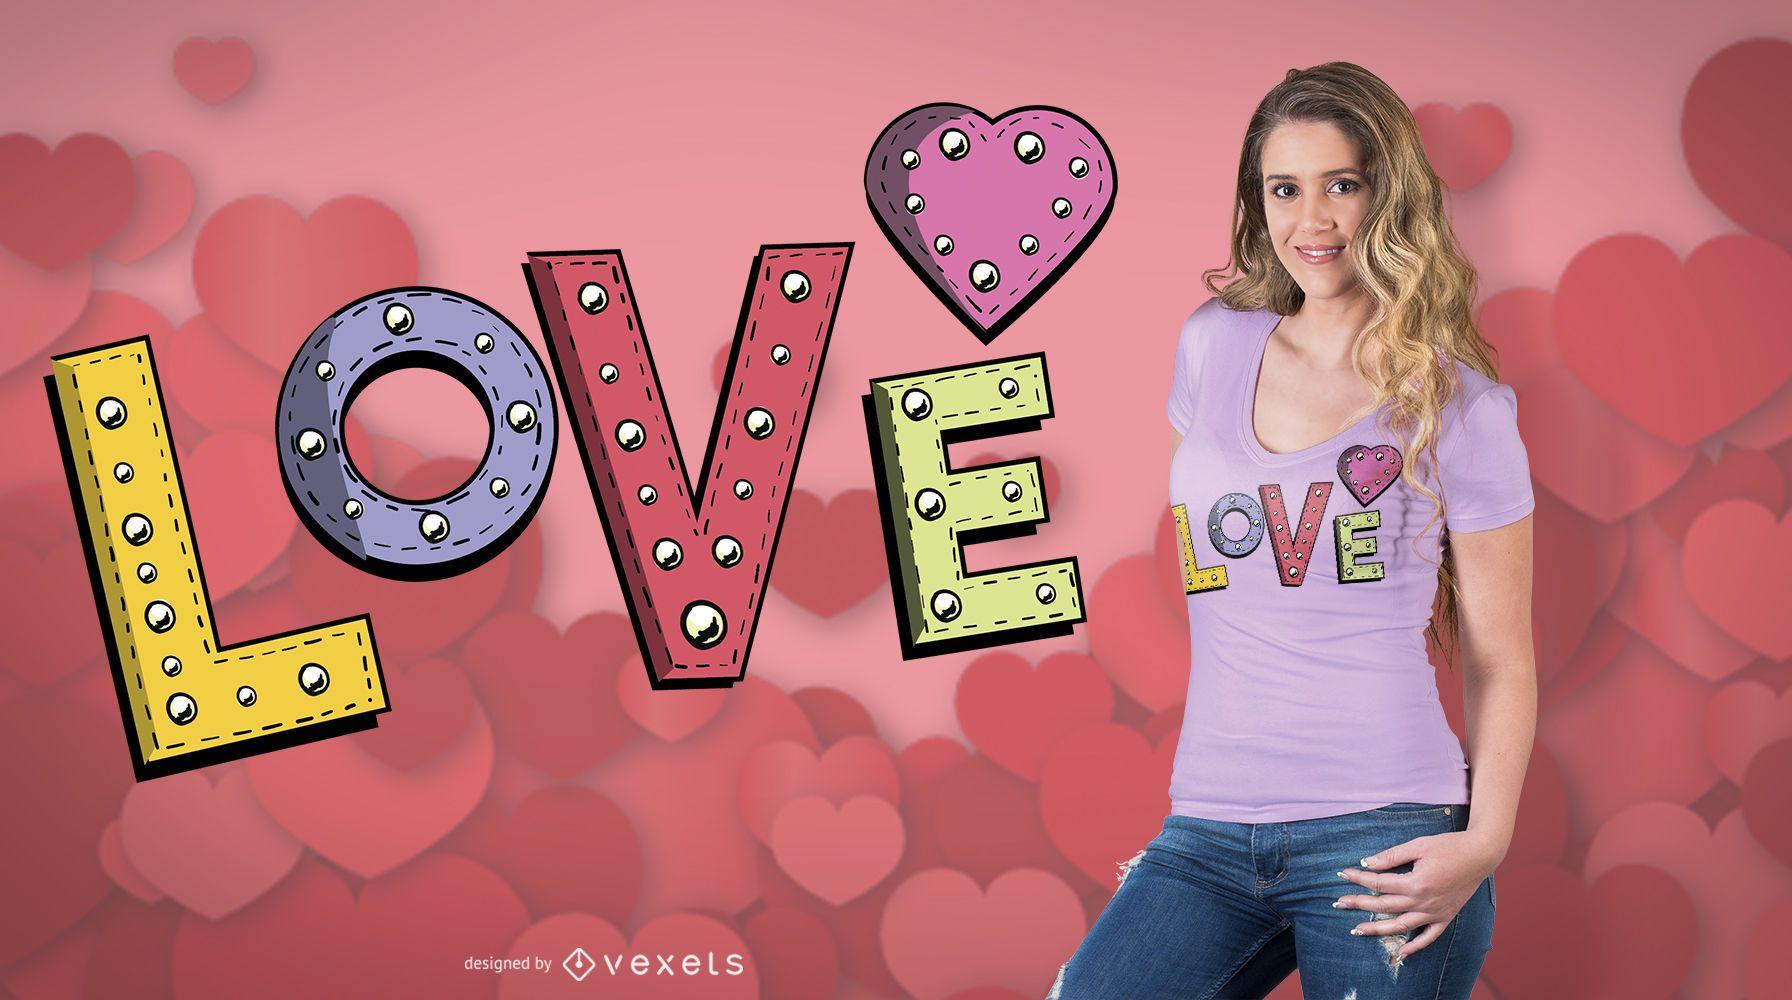 Love Stitched T-Shirt Design